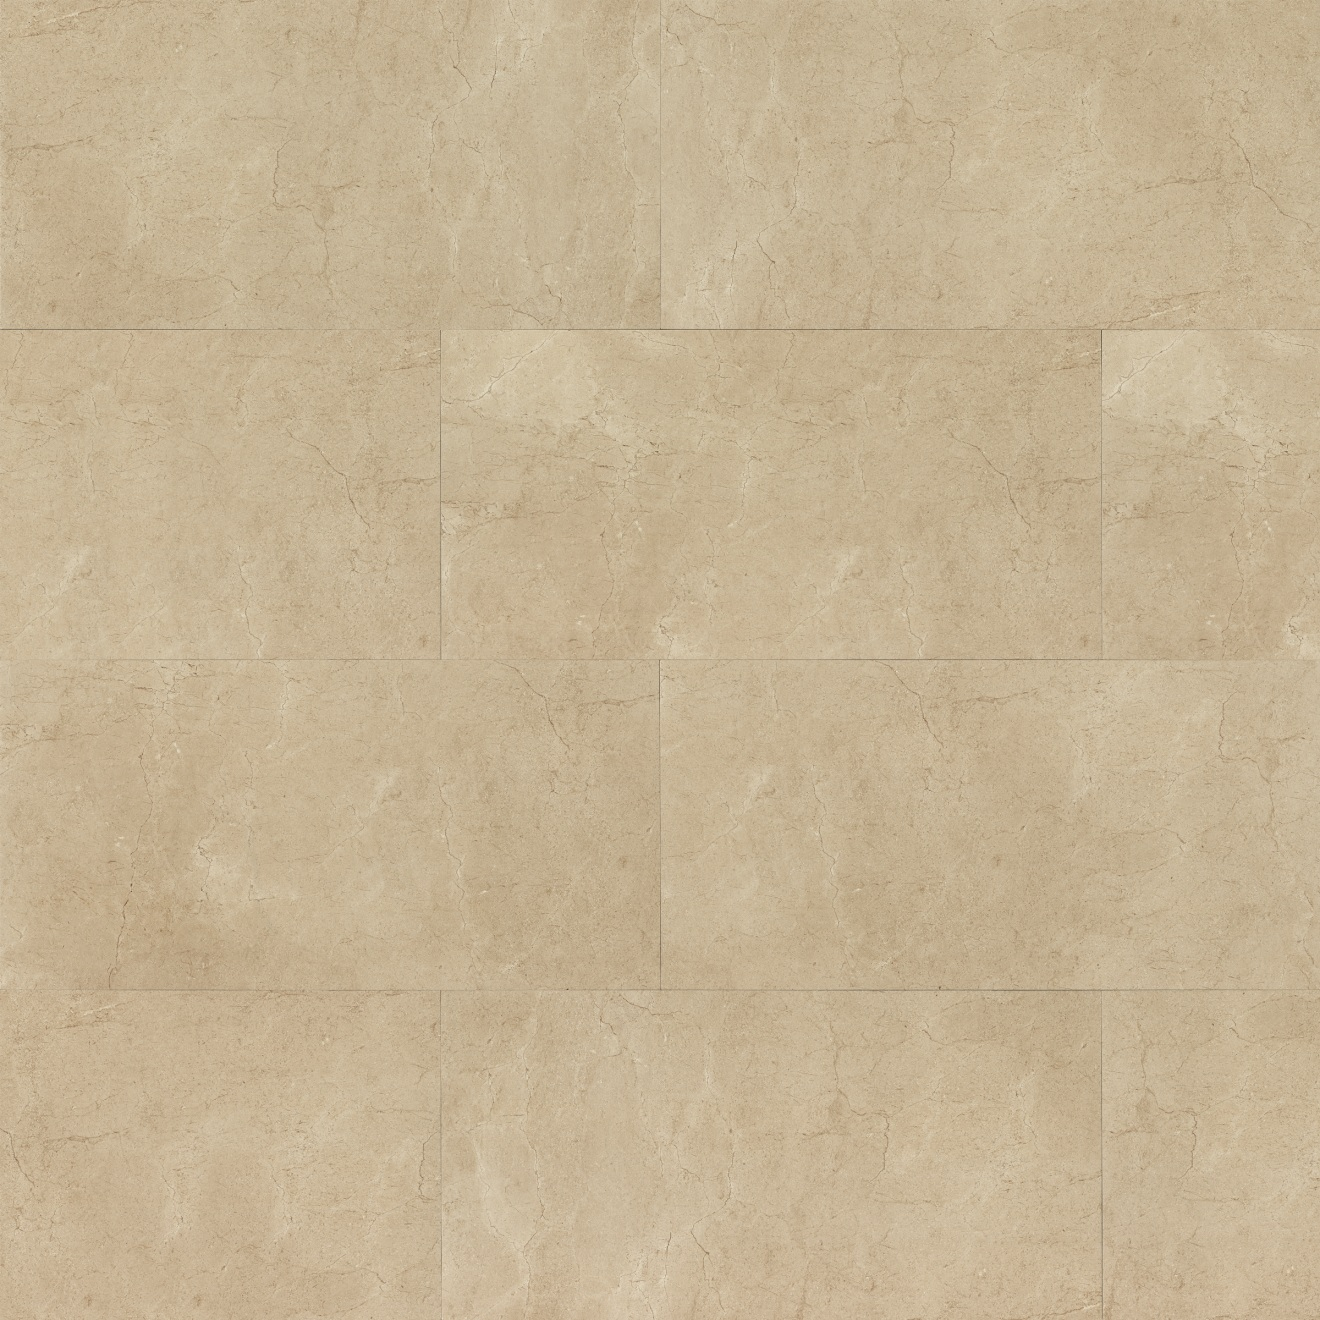 "Crema Marfil Porcelain Tile: Marfil 12"" X 24"" Floor & Wall Tile In Crema"